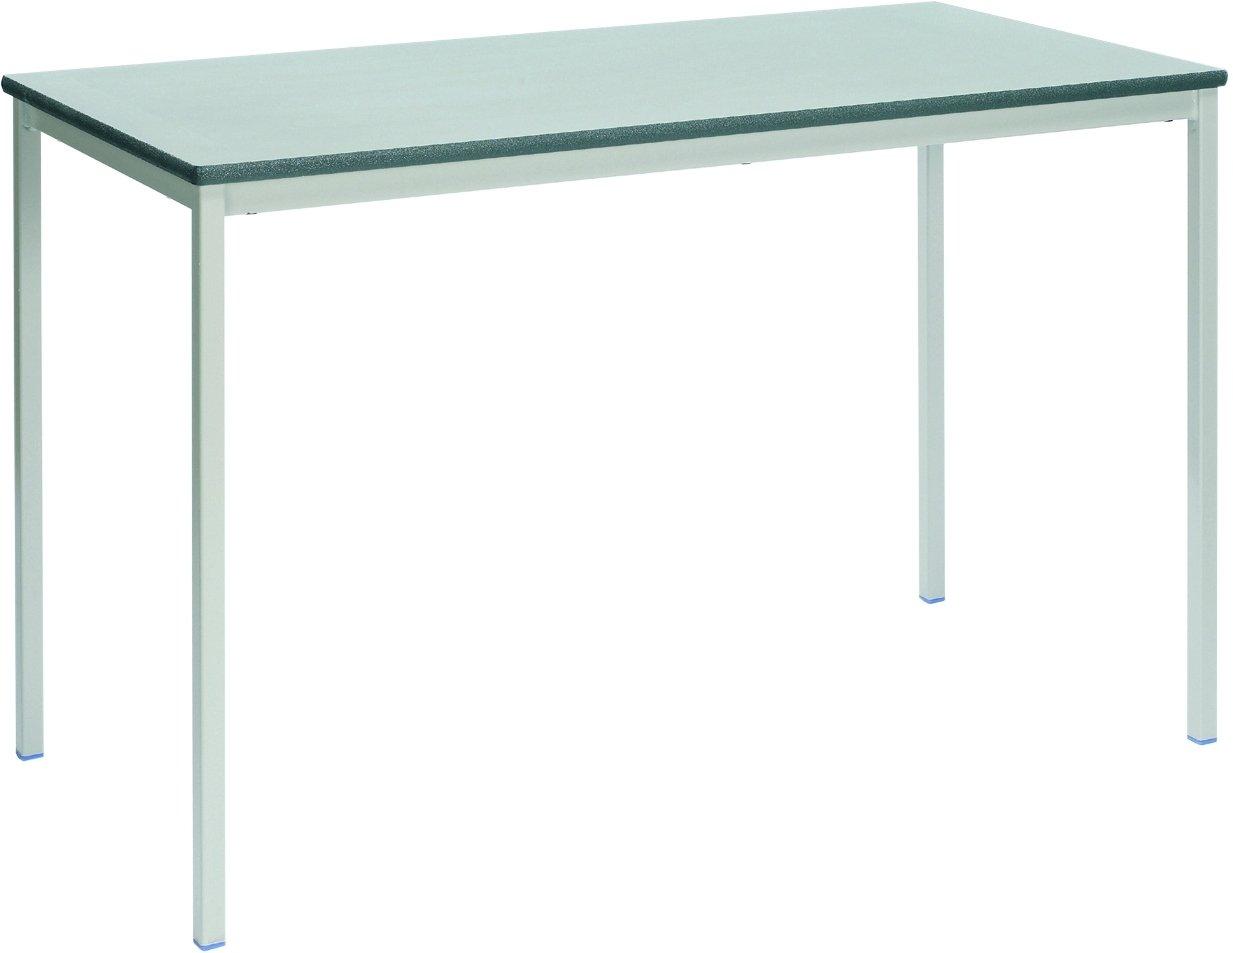 Metalliform Fully Welded Rectangular Table Size 1 (3 4 Years) 1100 X 550 PU